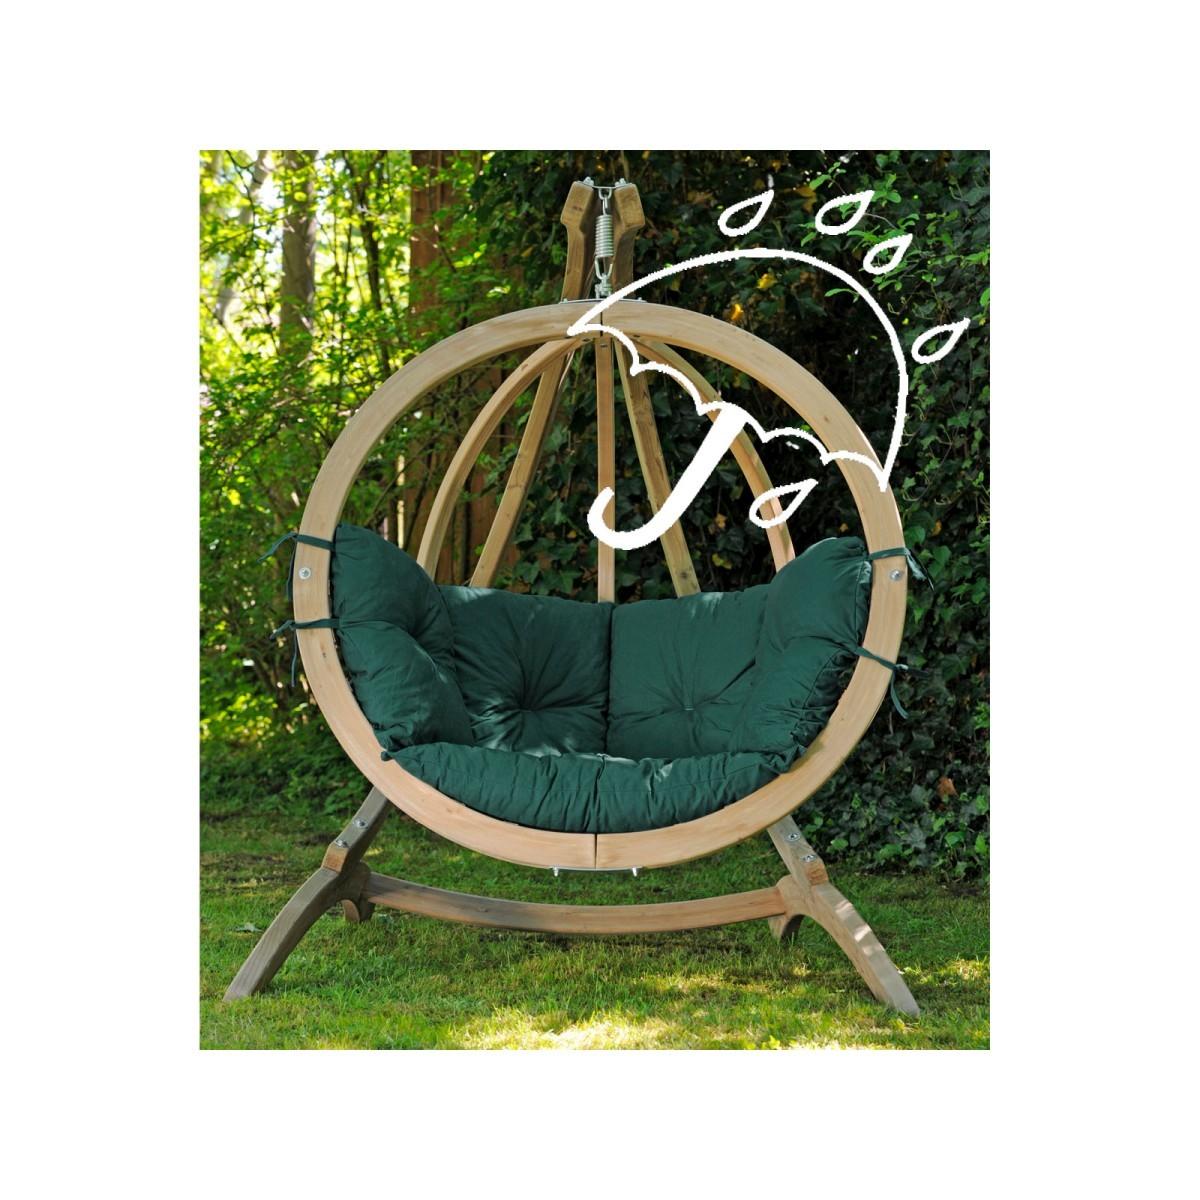 Amazonas fauteuil suspendu globo chair green weatherproof avec support - Fauteuil suspendu avec support ...